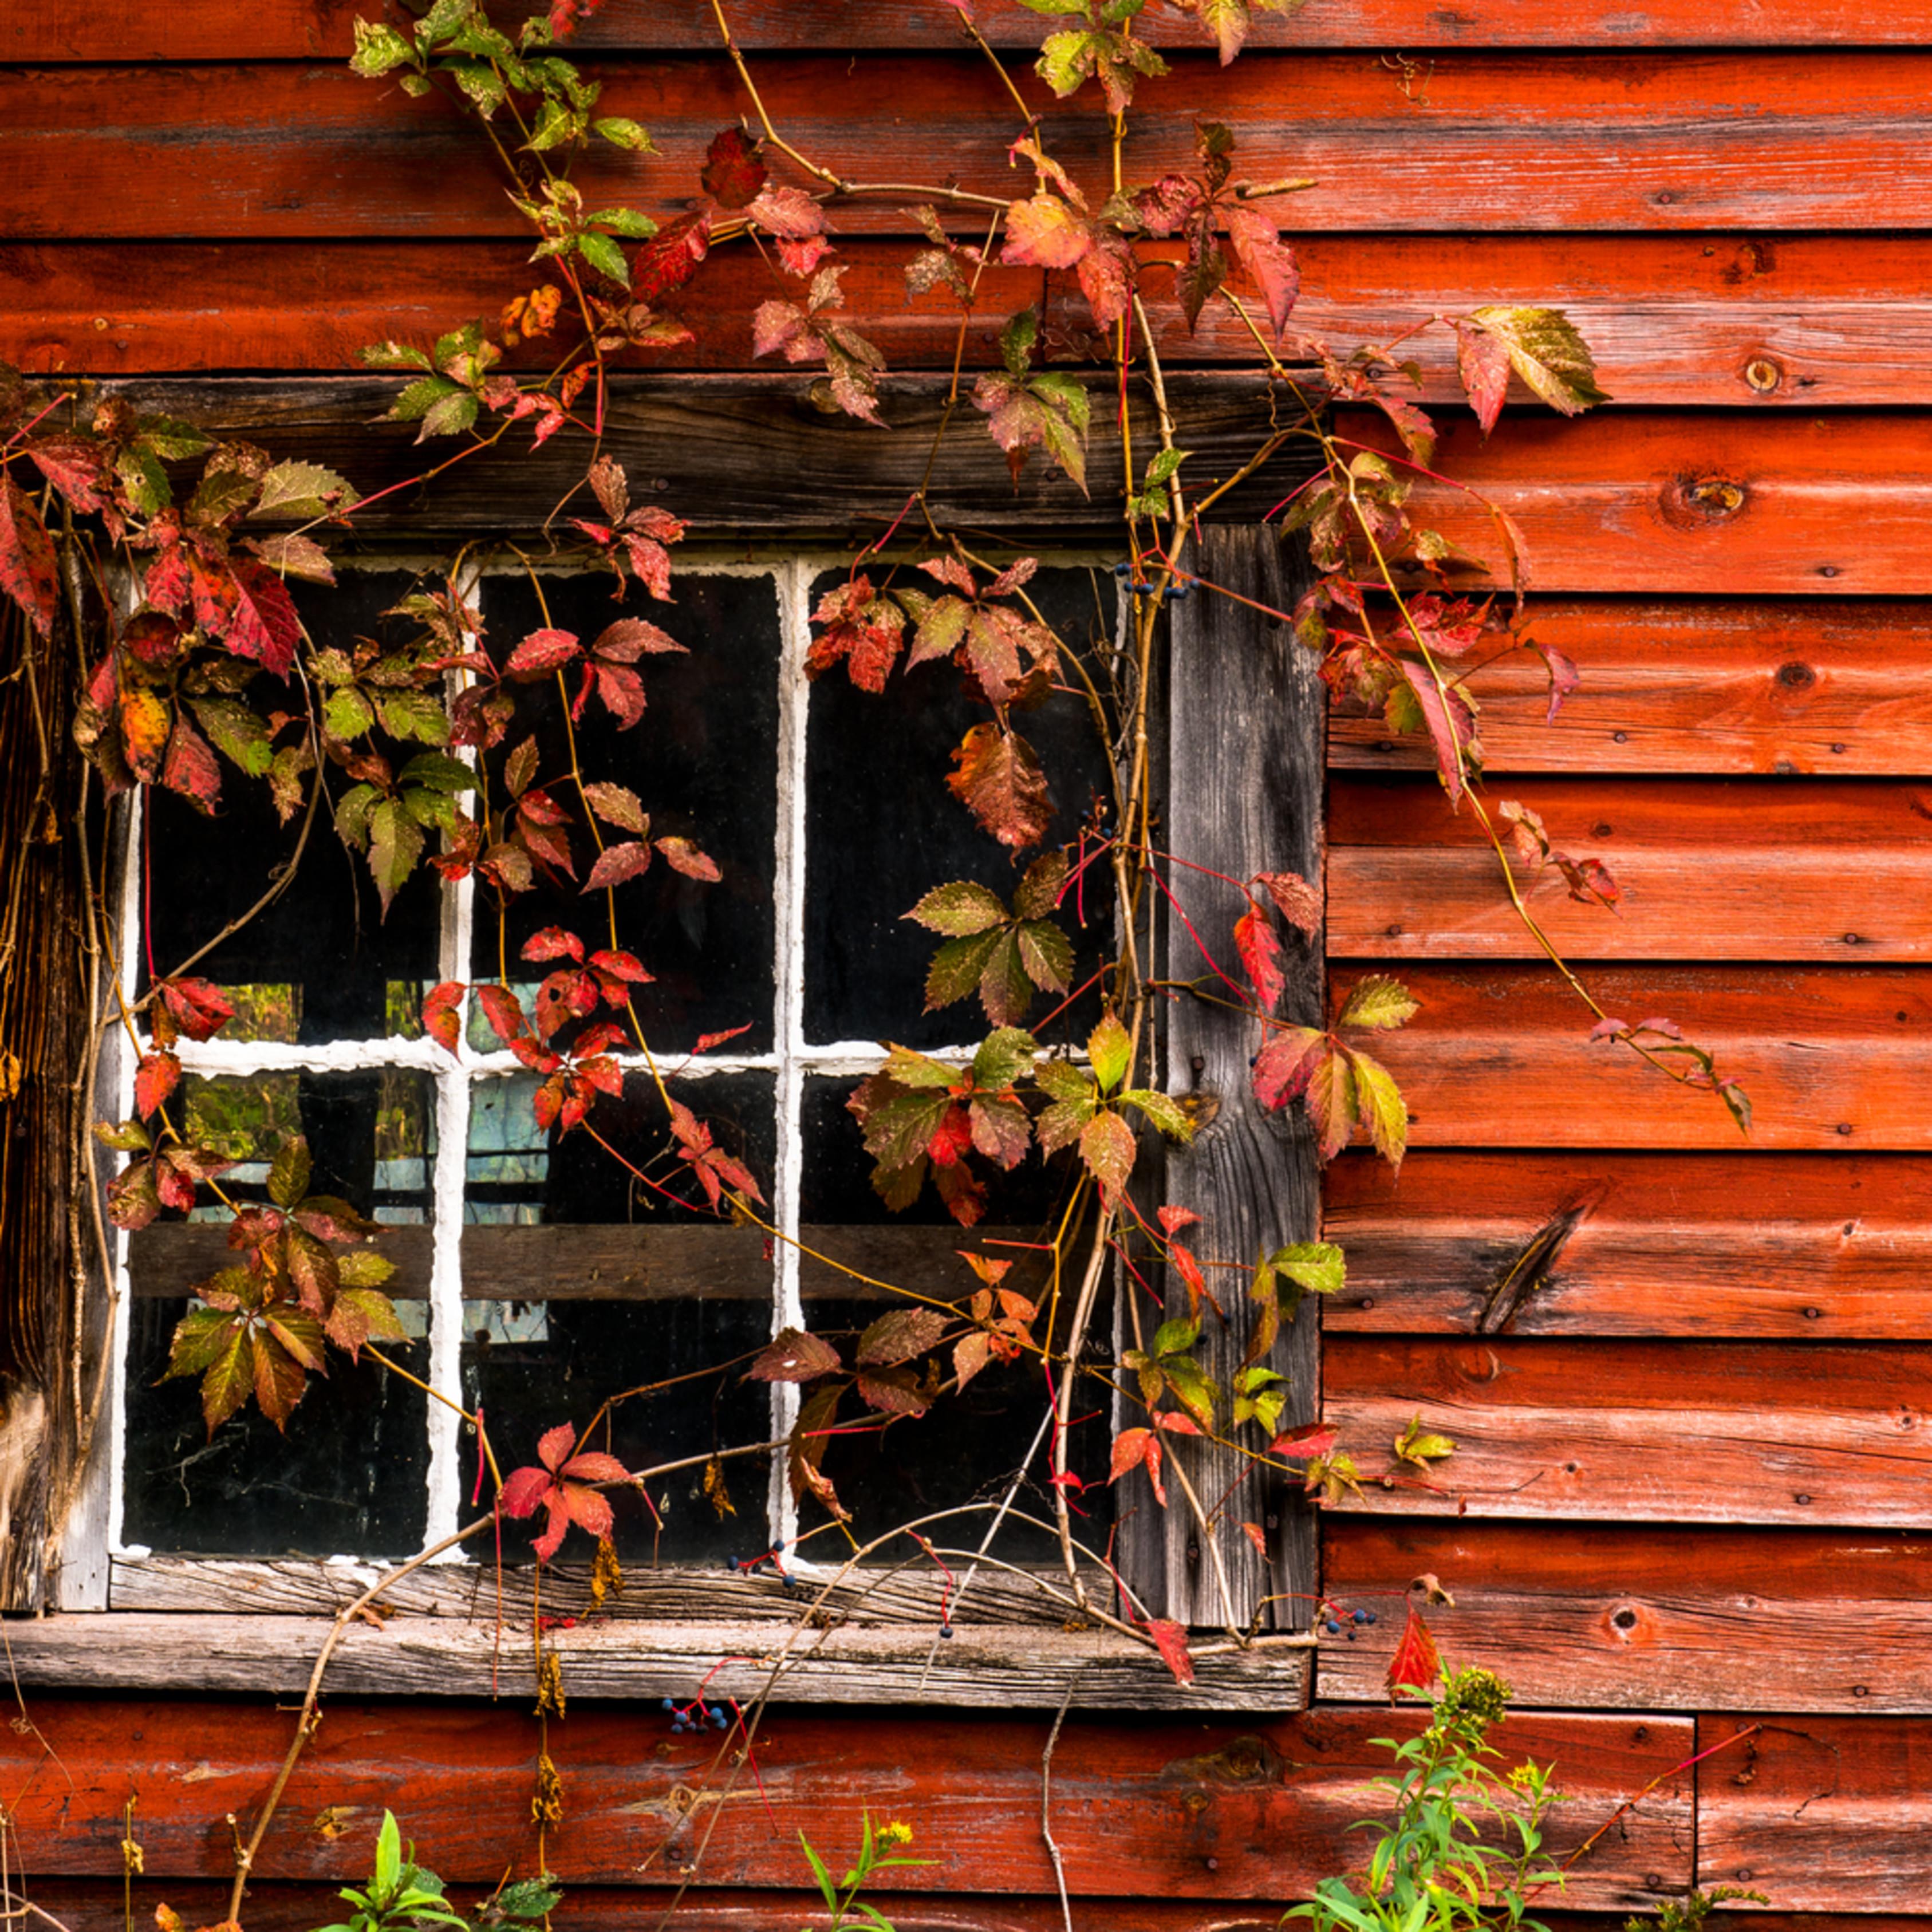 Rustic barn 3 uz9fht